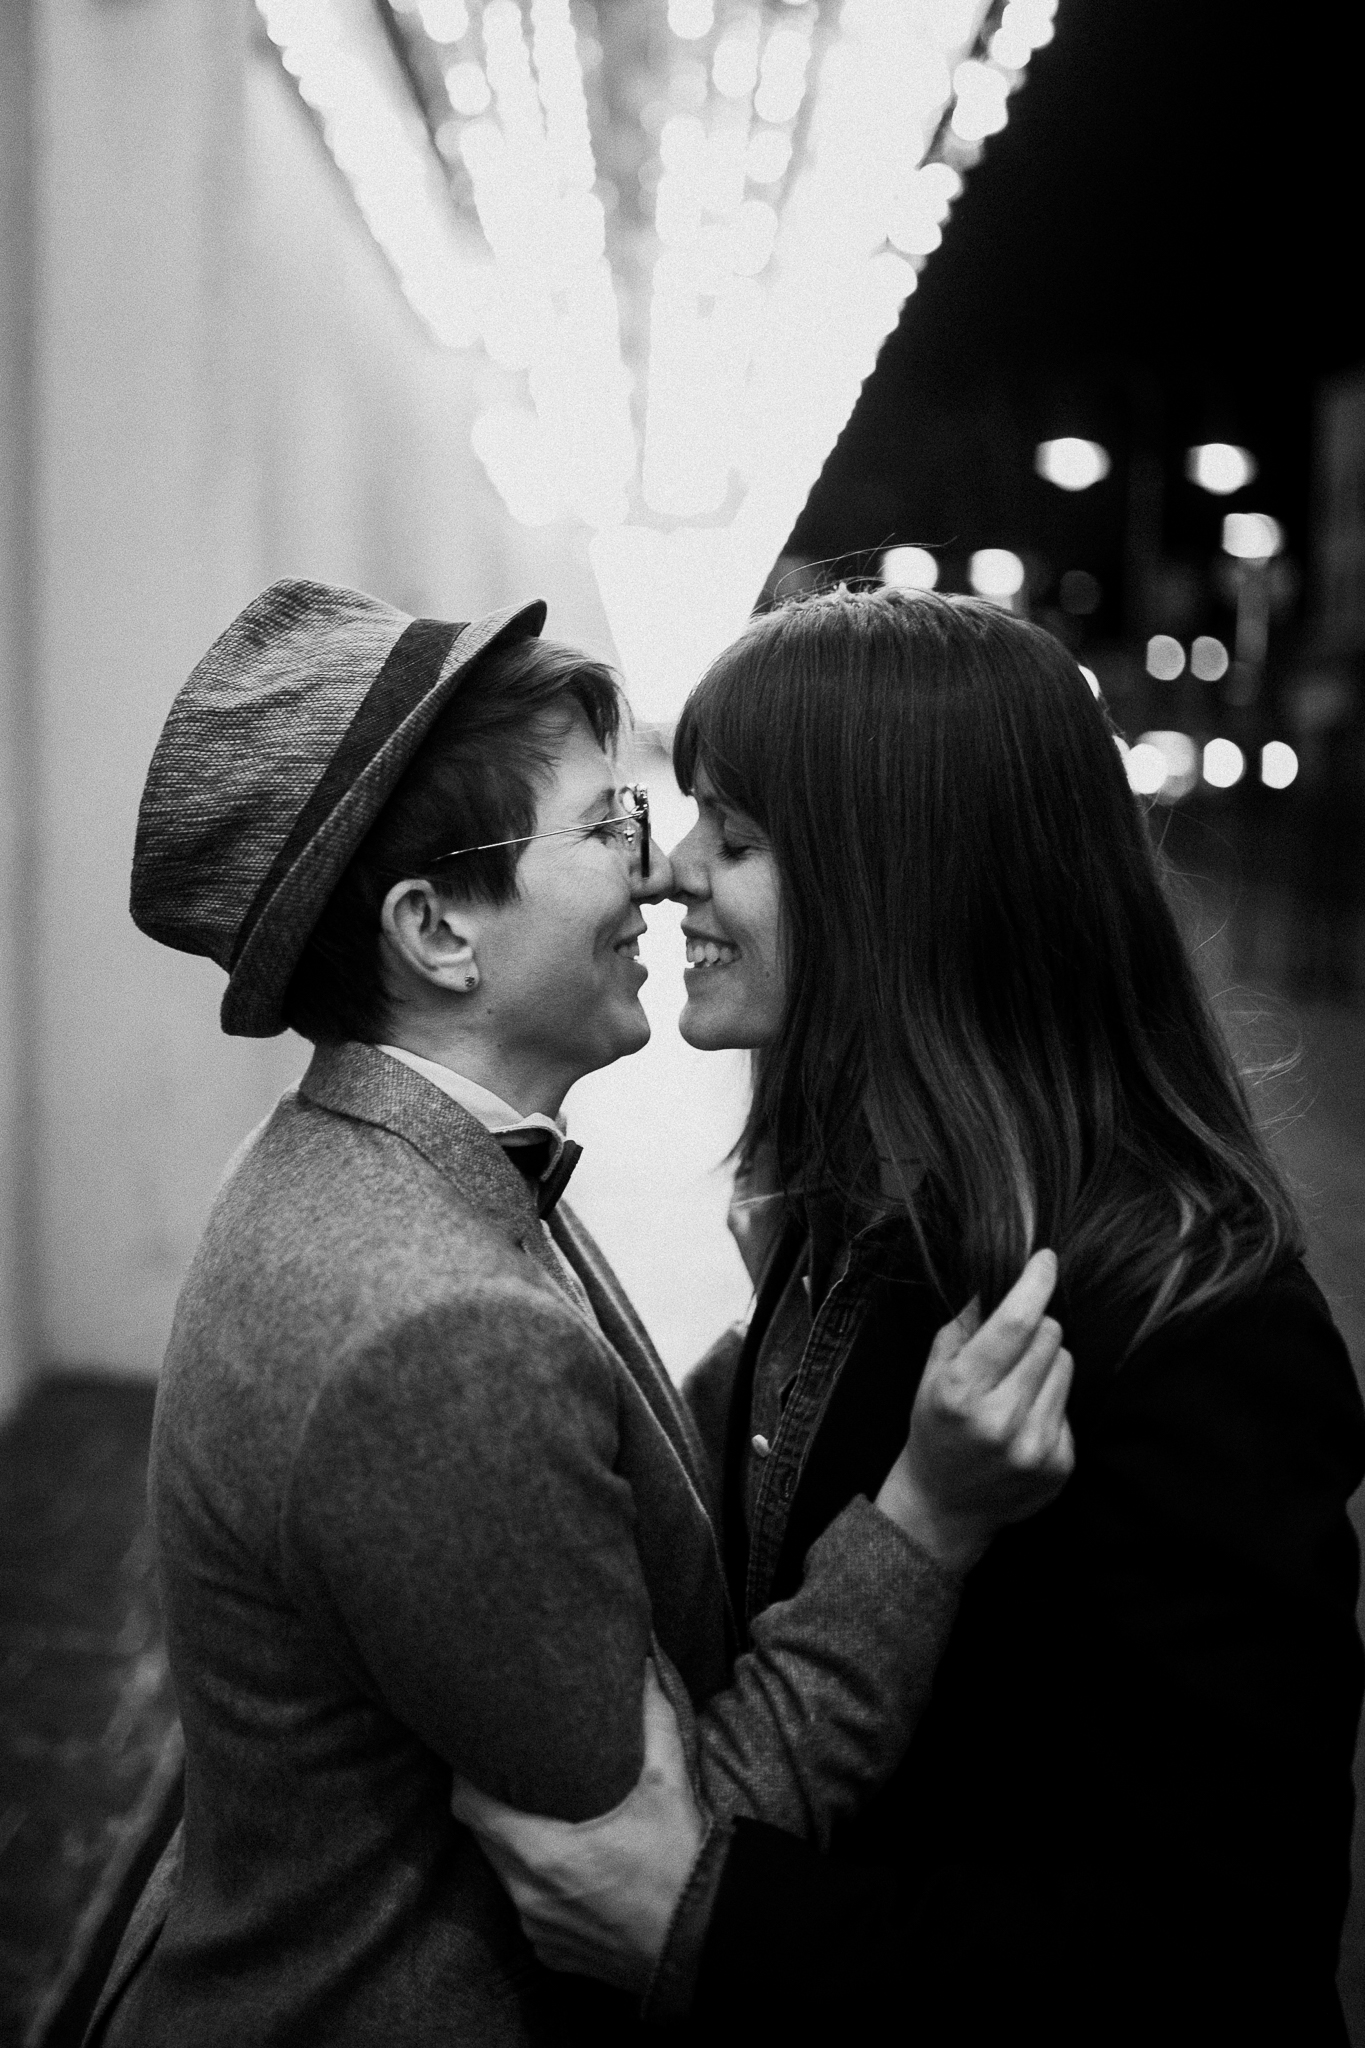 Archer Inspired Photography Hilary and Gia LGTBQ Reno Nevada Couple Wedding Engagement Photographer-9.jpg